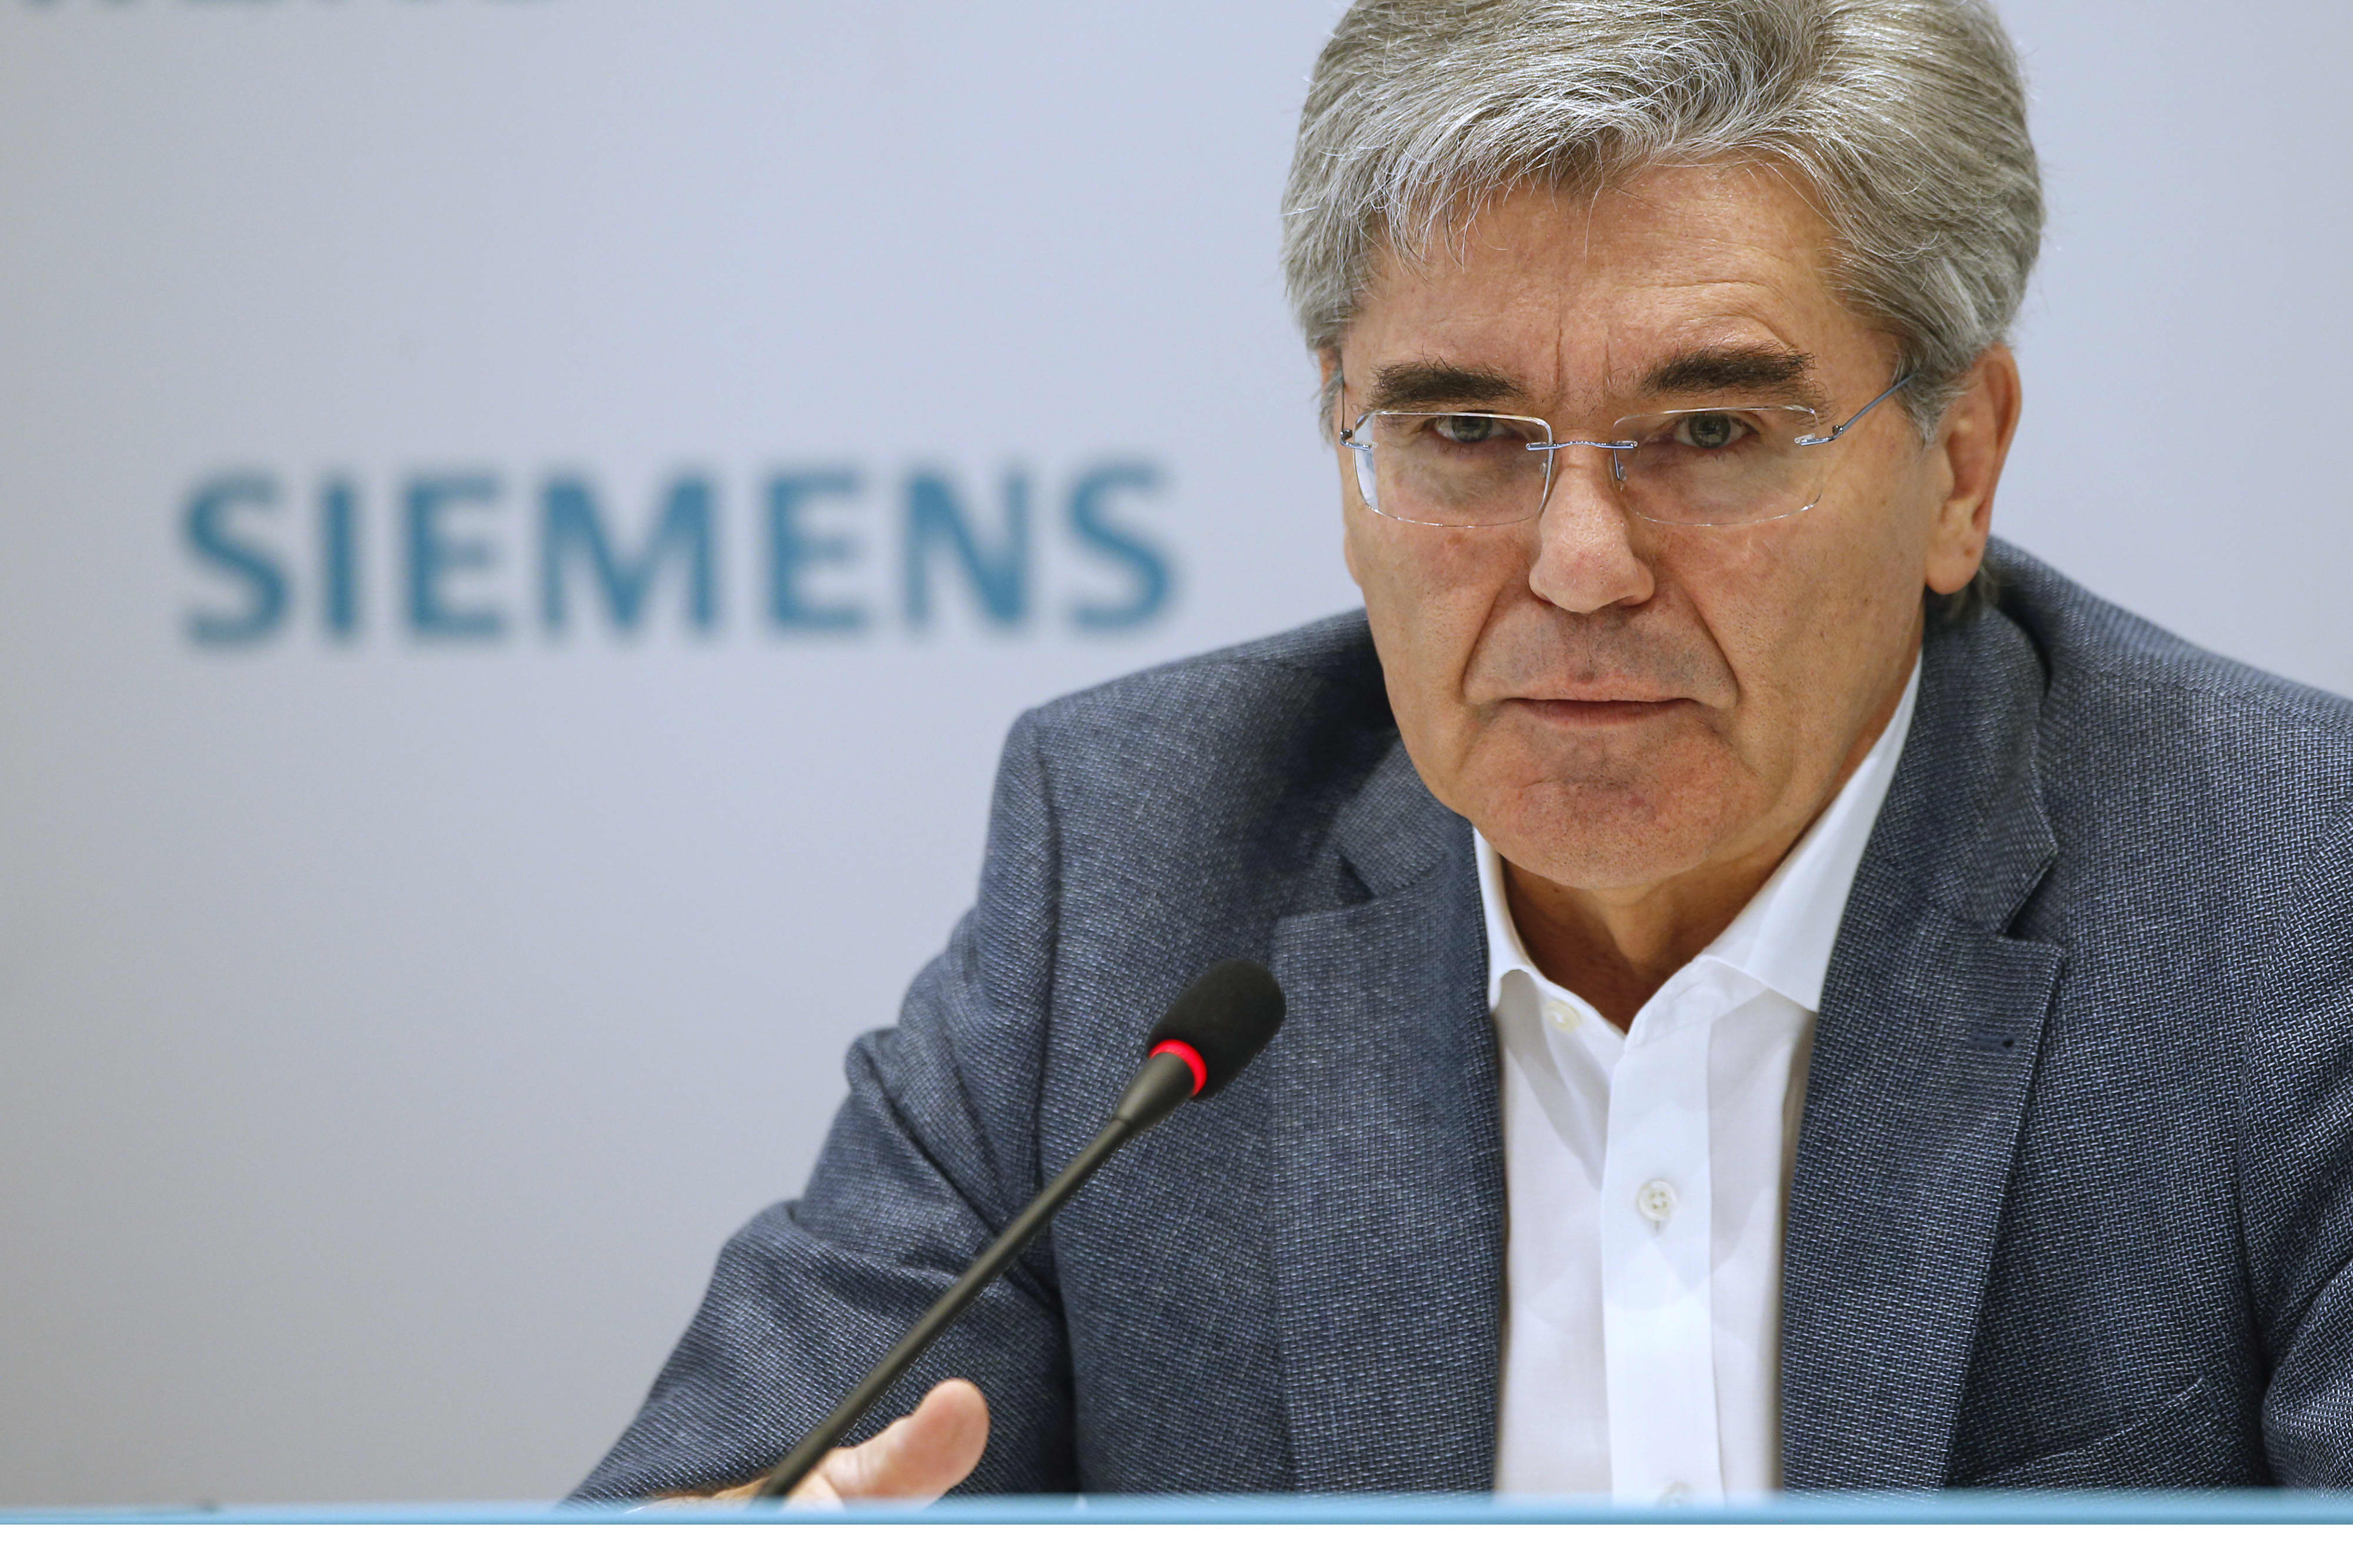 Siemens posts profit beat but strikes gloomy tone